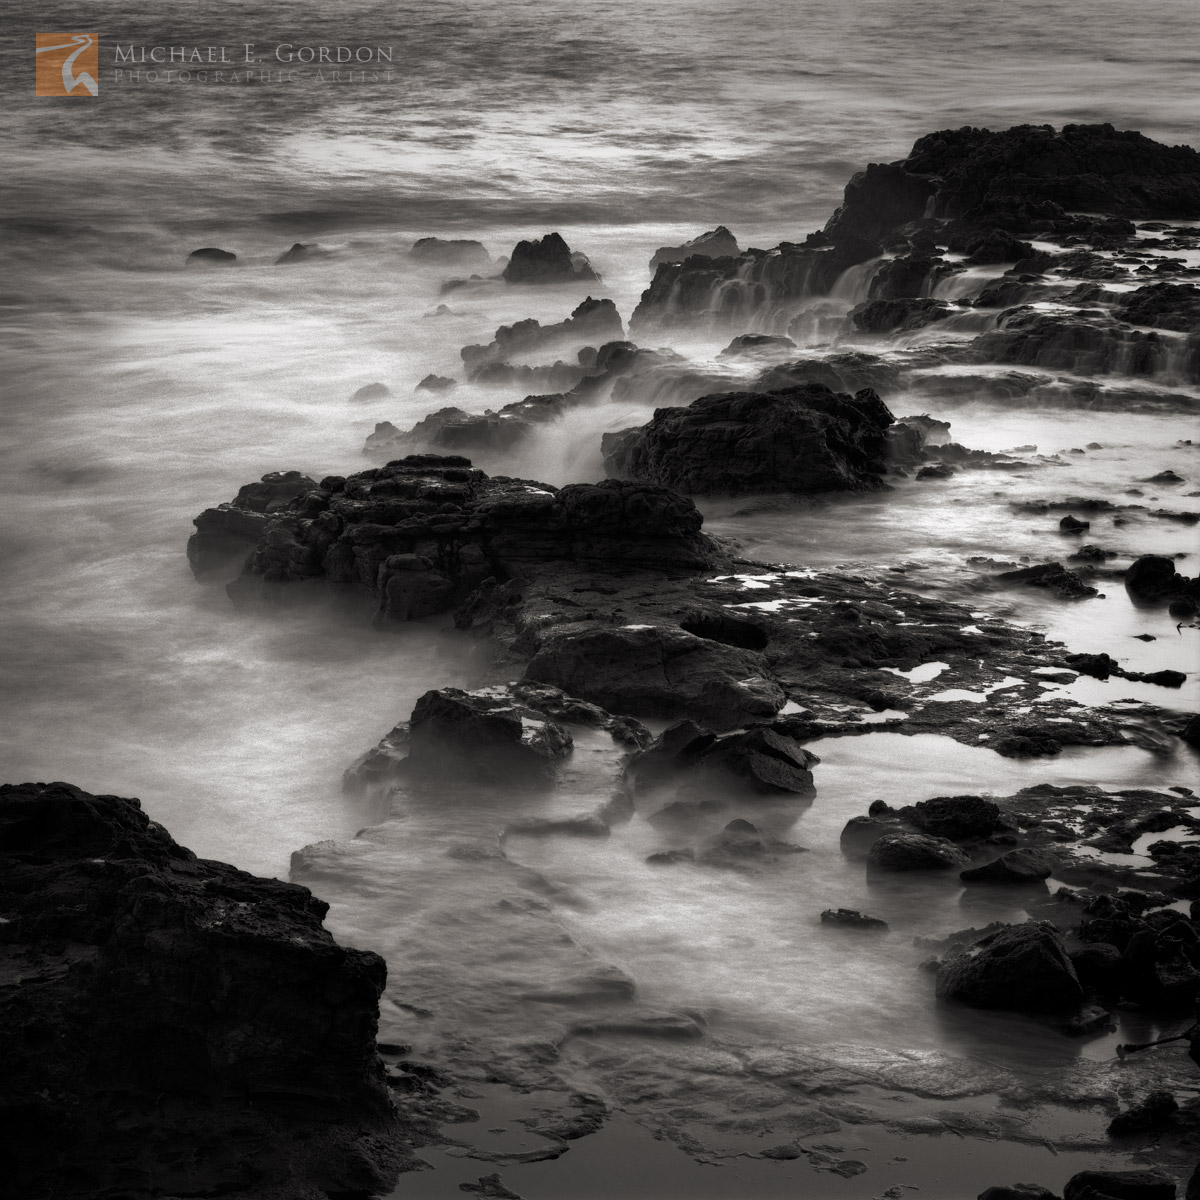 cauldron, Kaua'i, Hawai'i, long exposure, misty, ethereal, rocky, coastline, photo